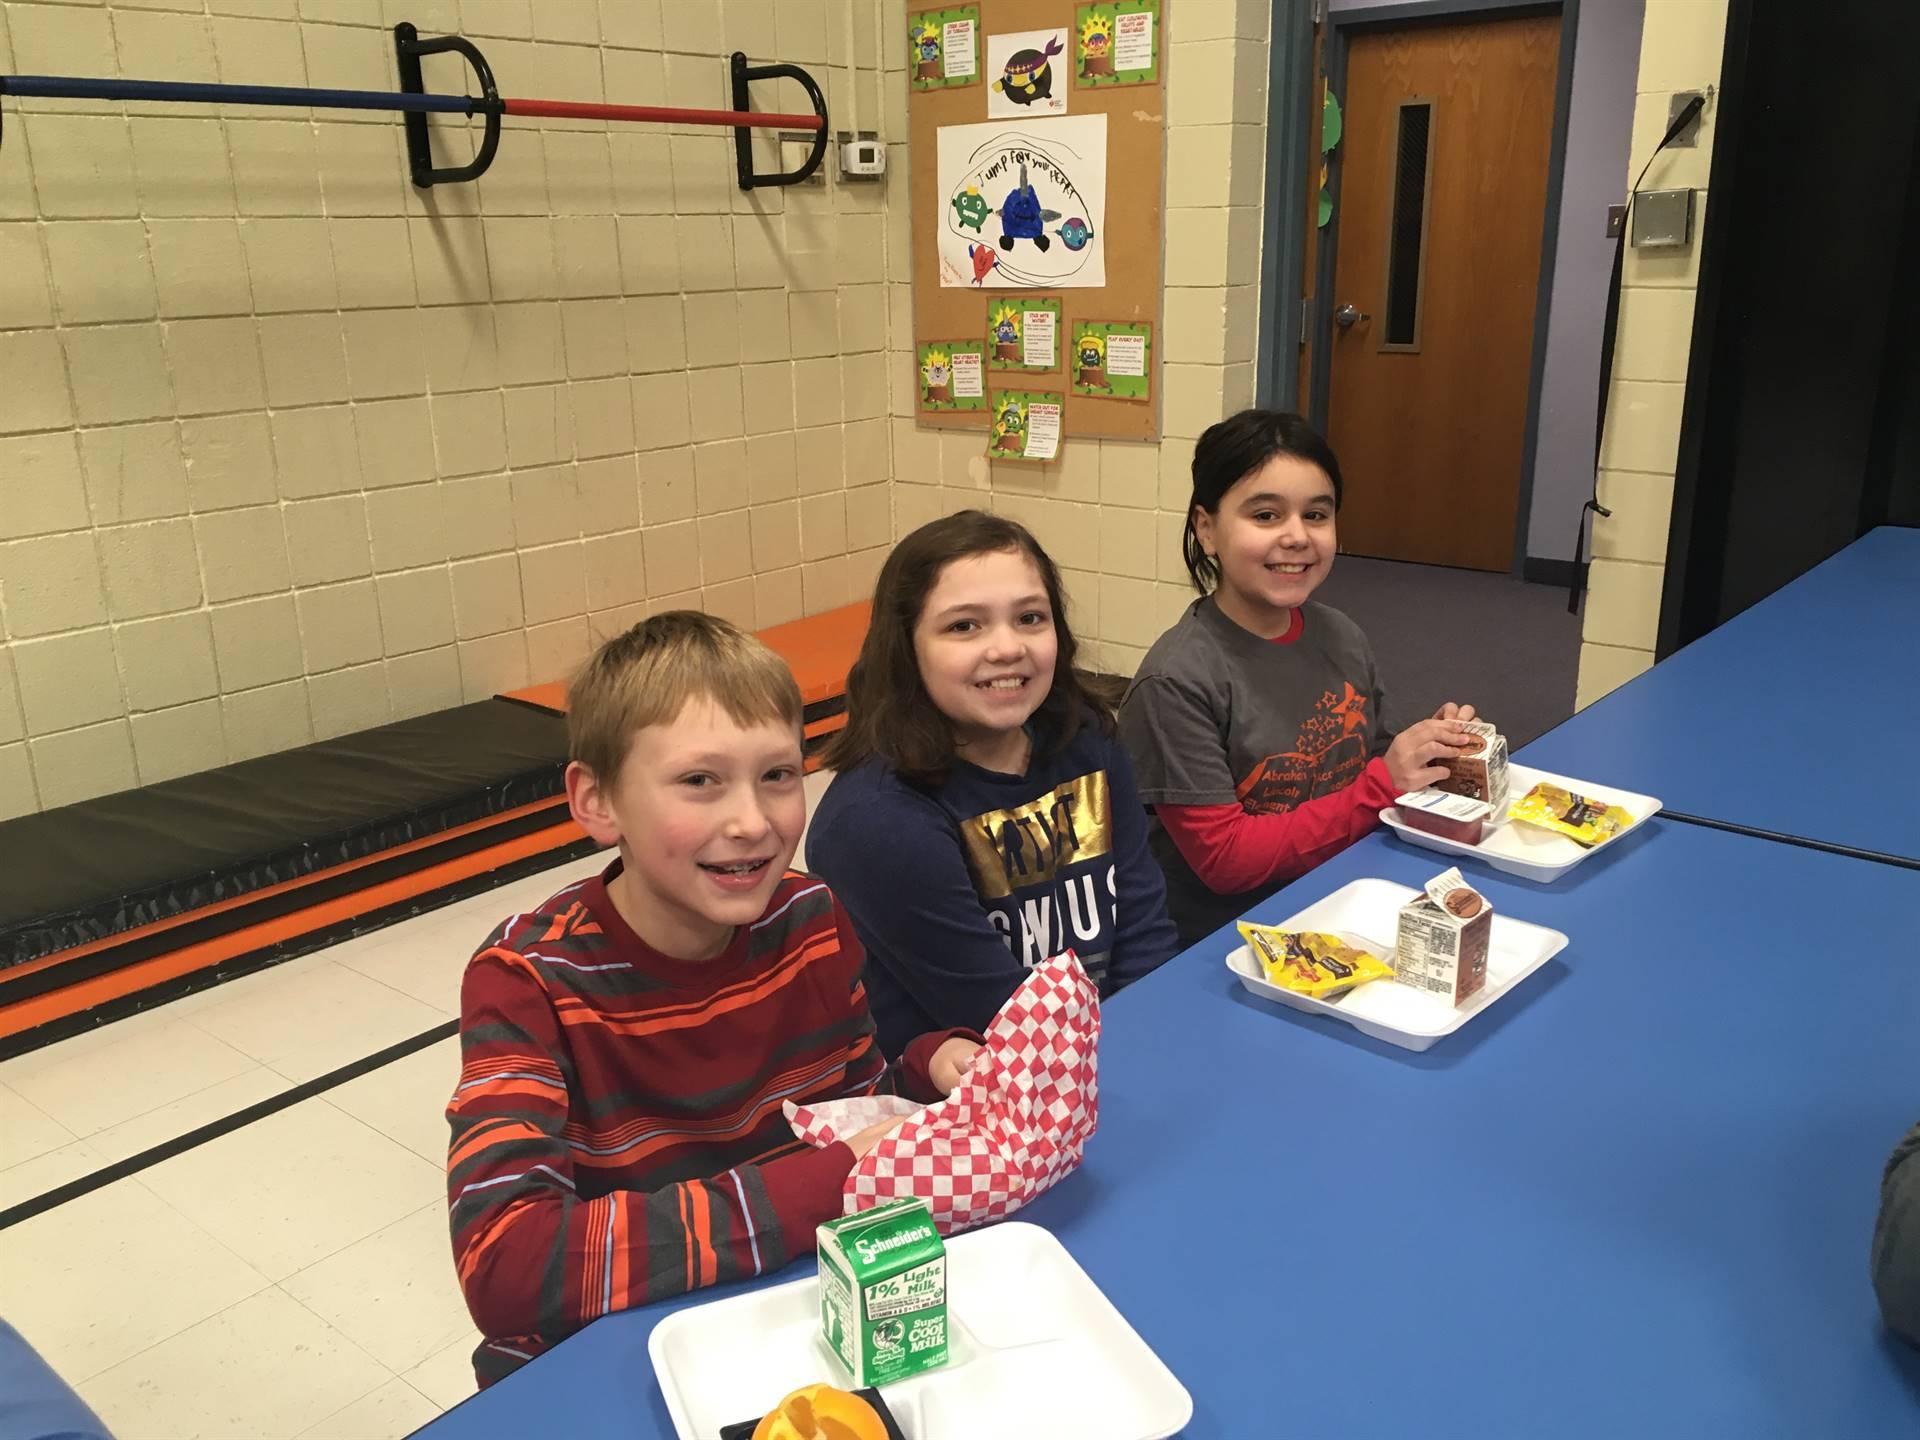 Students eating breakfast